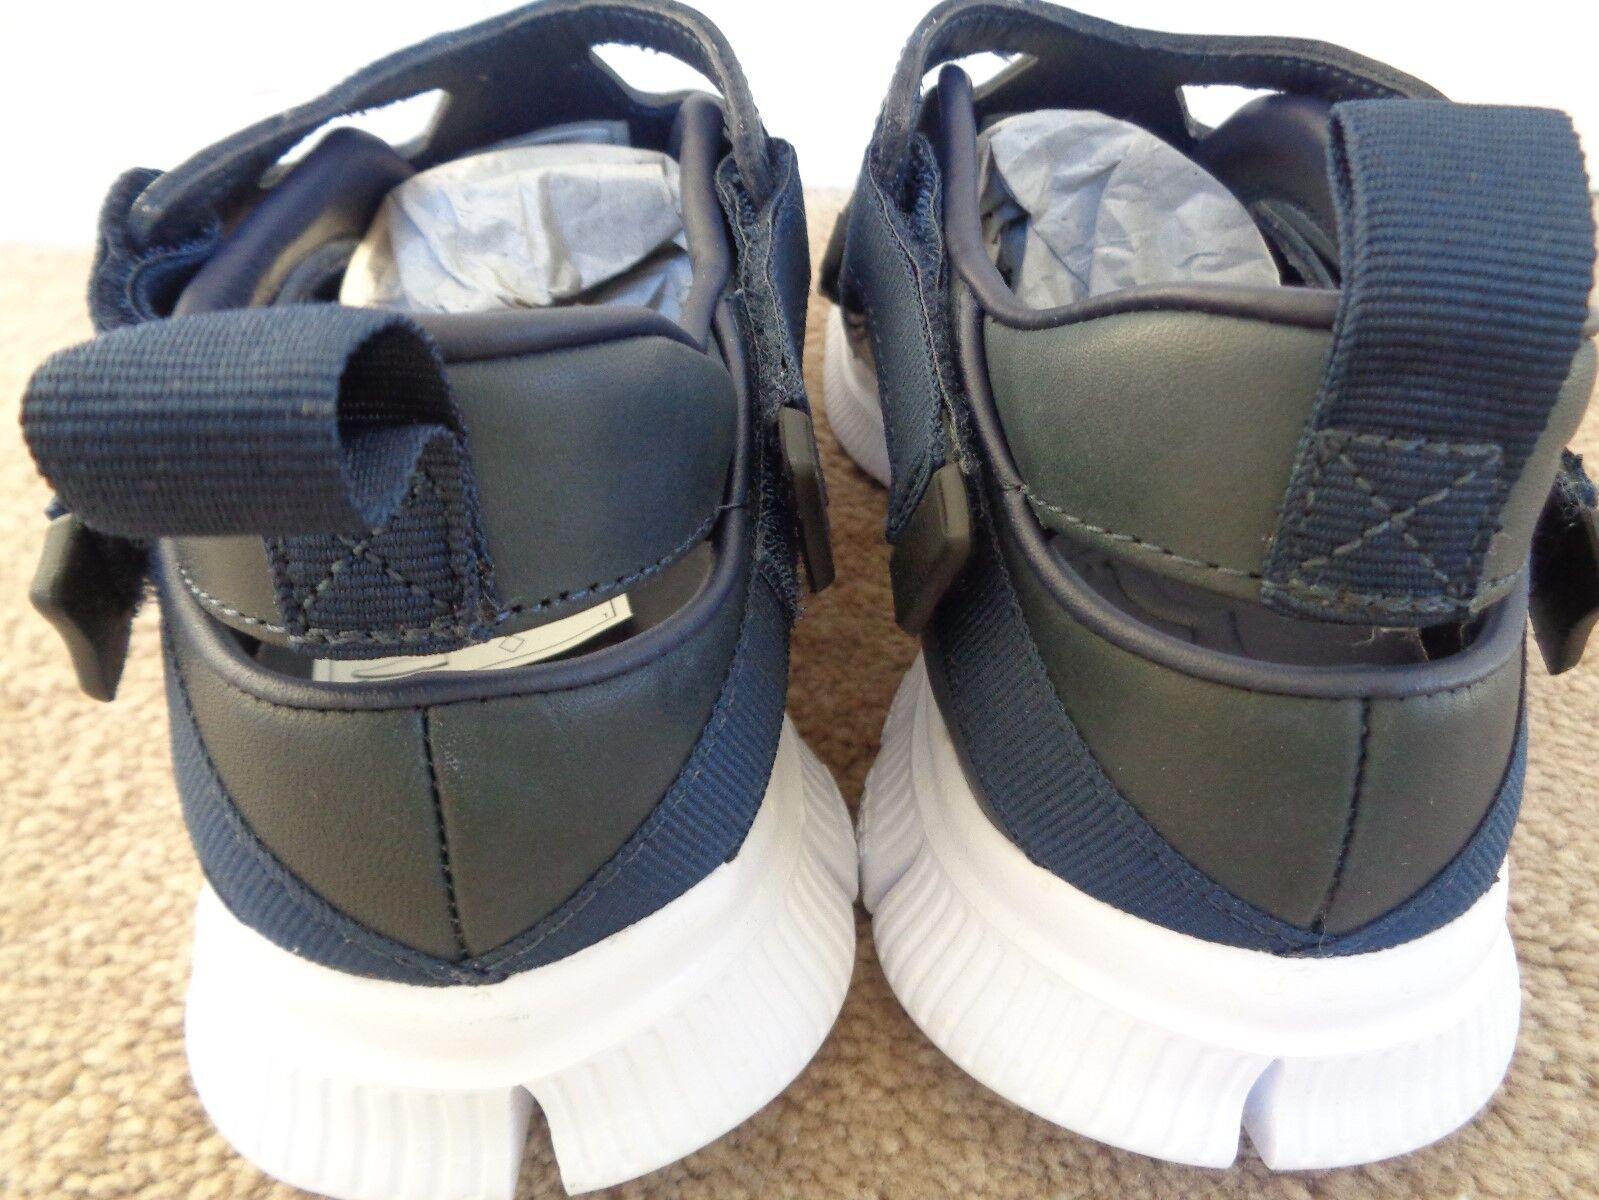 Nike Free Huarache Carnivore SP mens trainers Turnschuhe Turnschuhe Turnschuhe schuhe 801759 413 NEW+BOX 99e41d